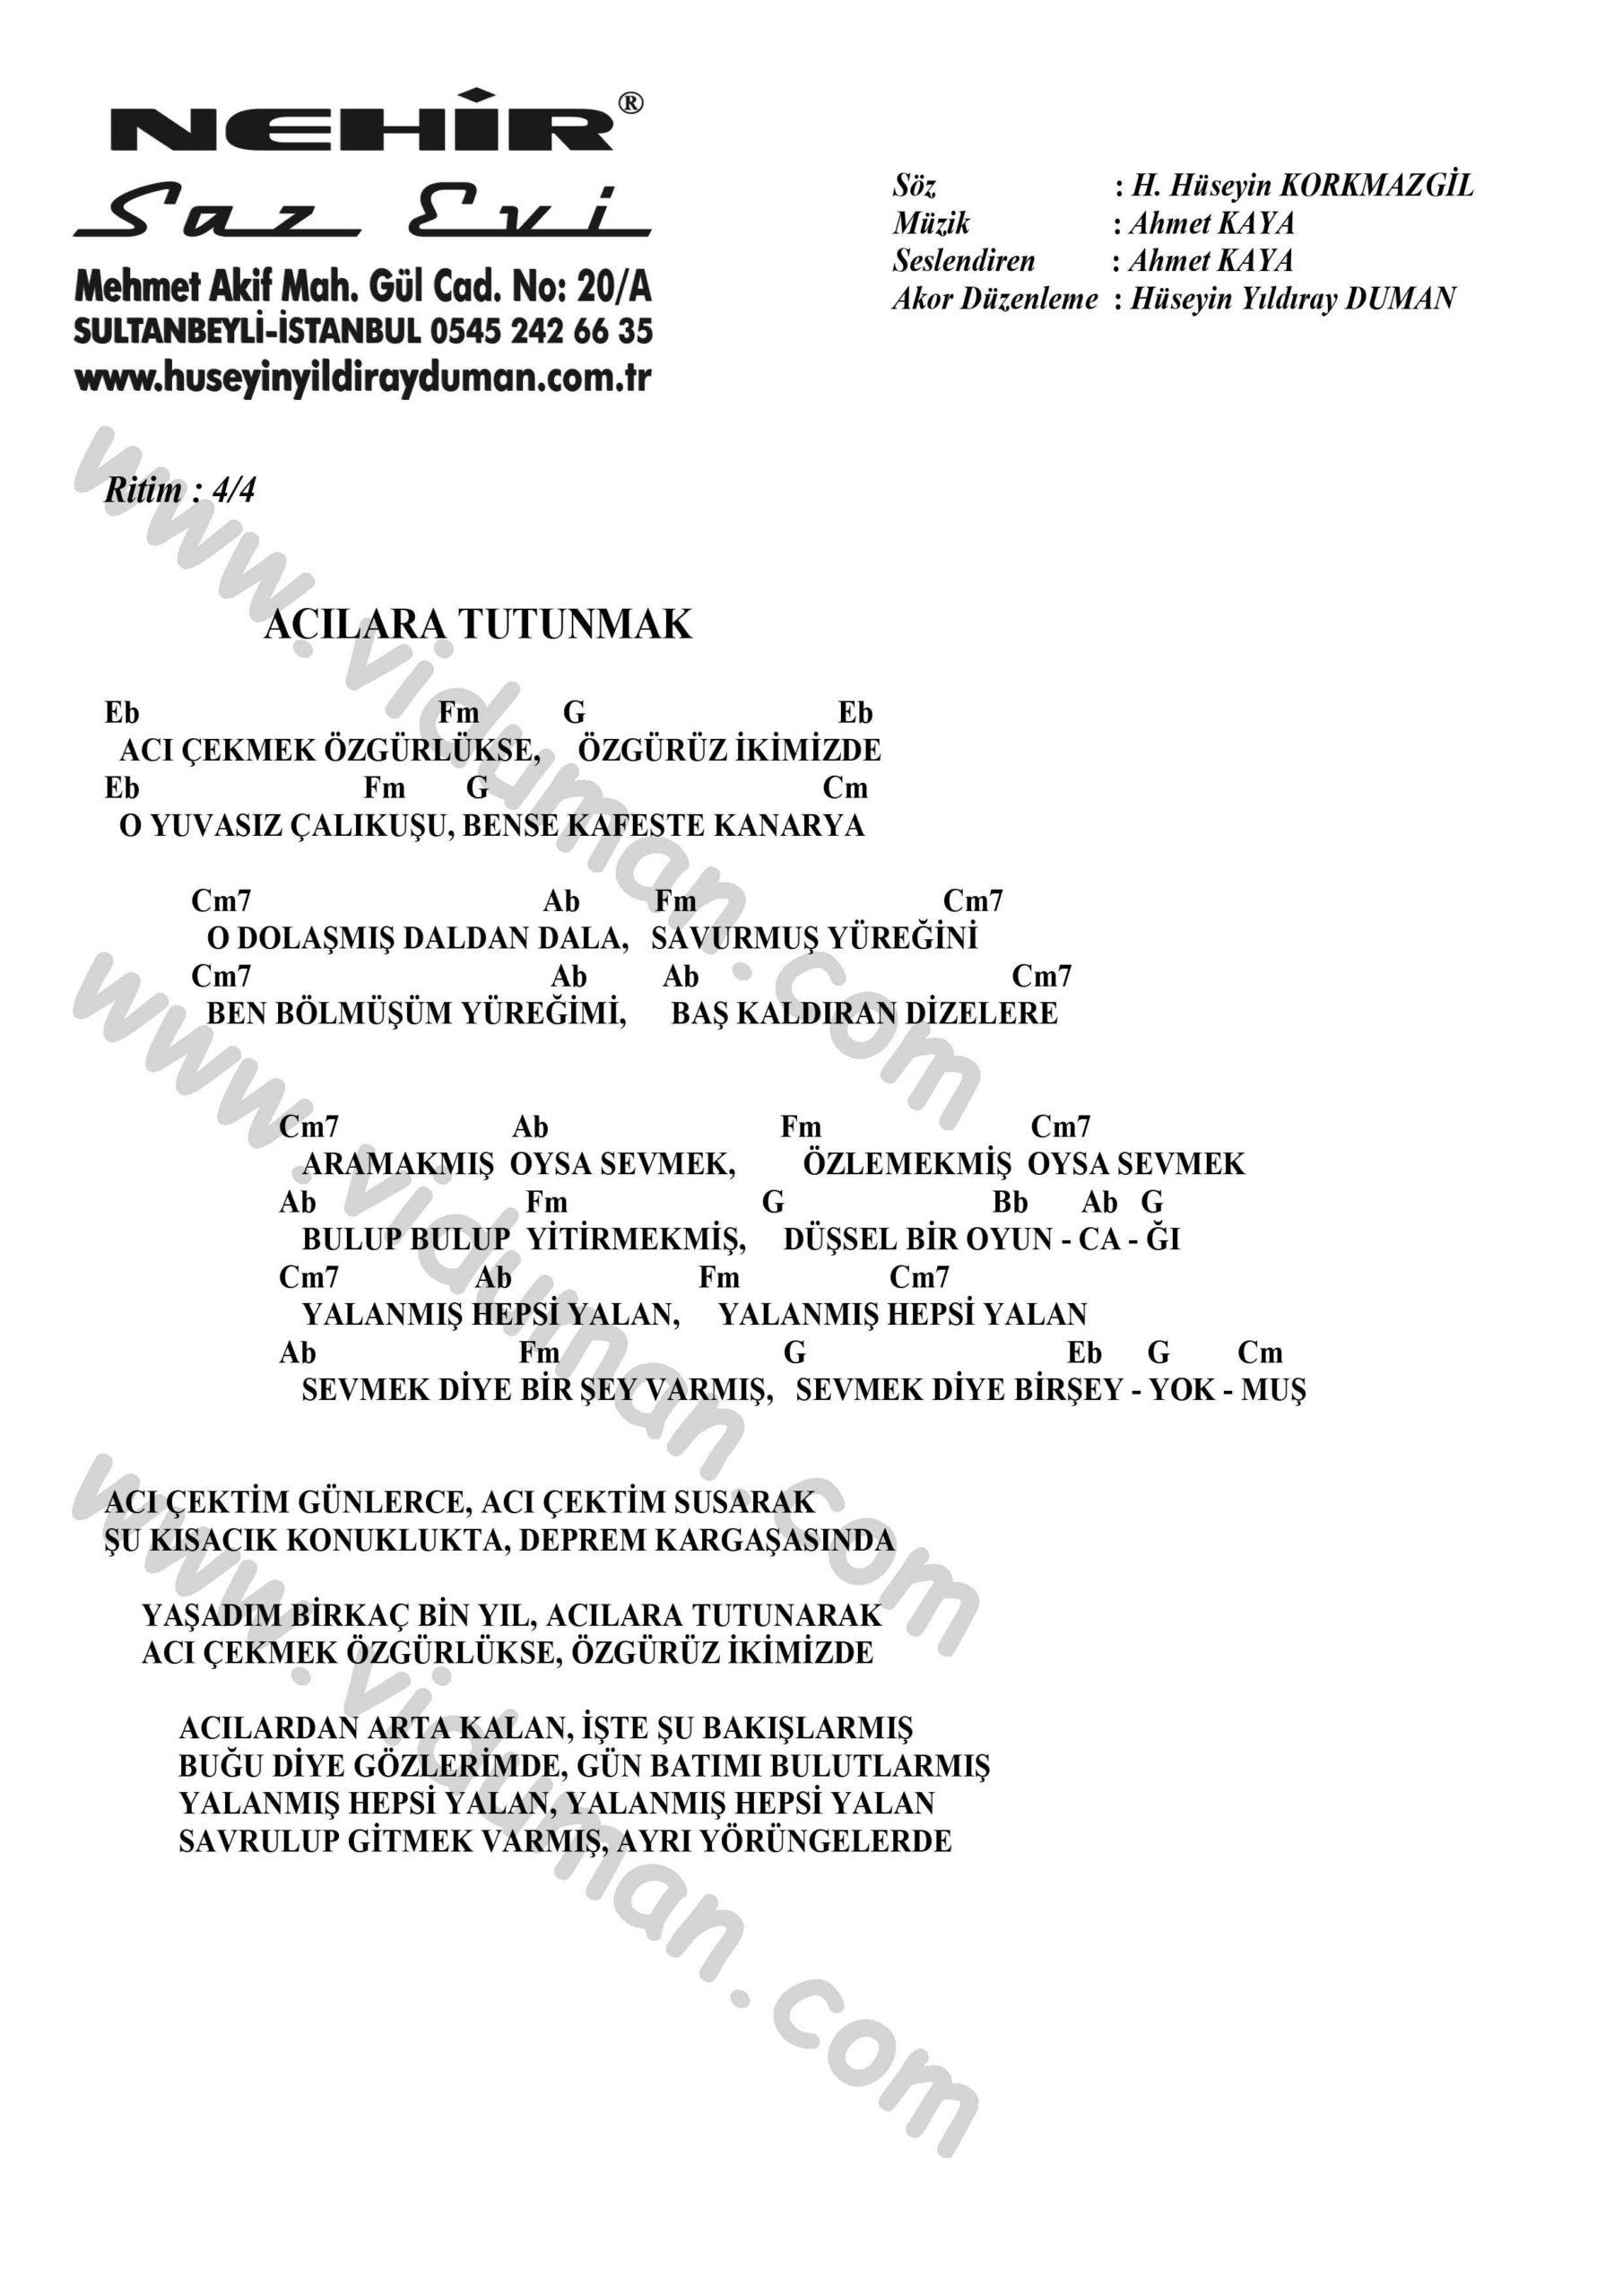 Acilara Tutunmak-Ahmet Kaya-Ritim Gitar Akorlari